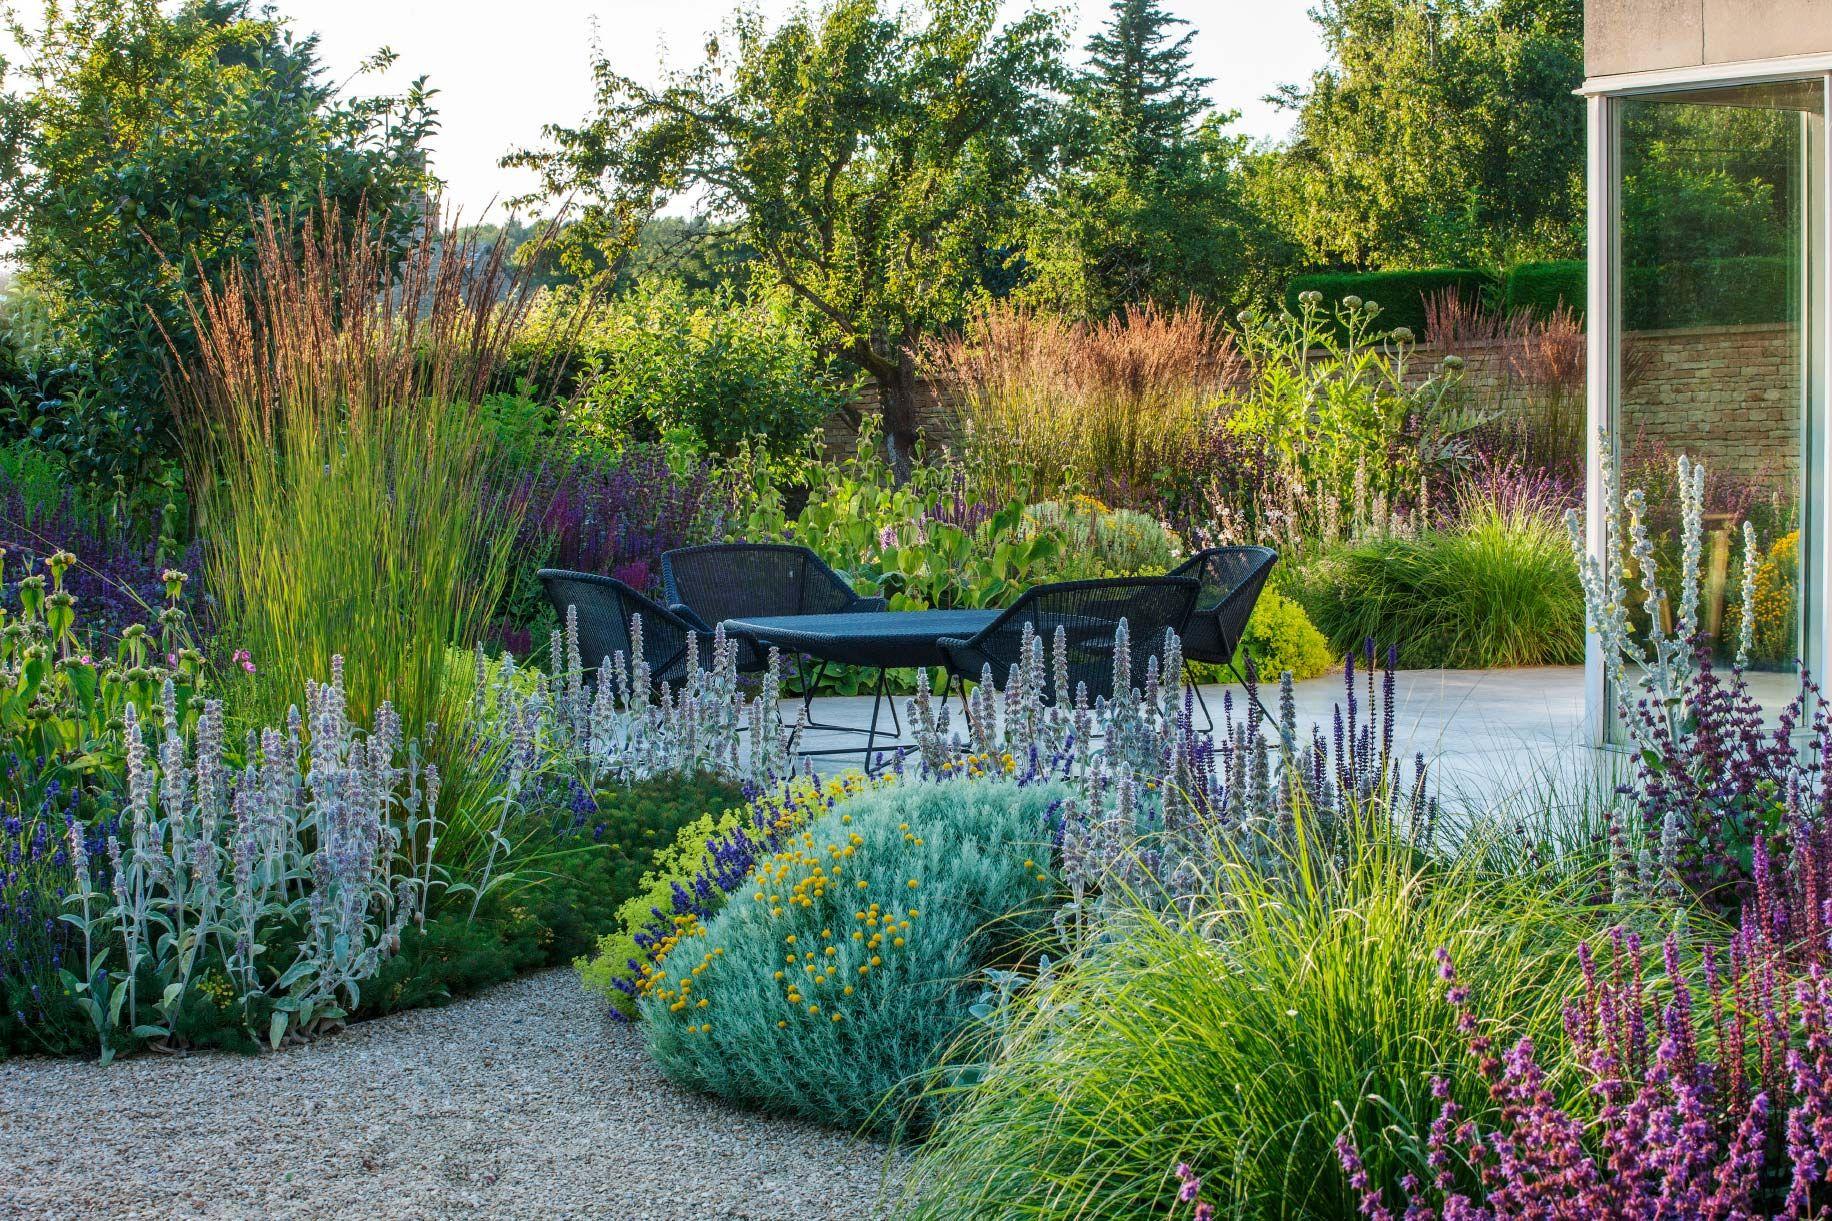 Marcus Barnett Studio Cotswolds Garden Design Images Landscape Design Beautiful Gardens